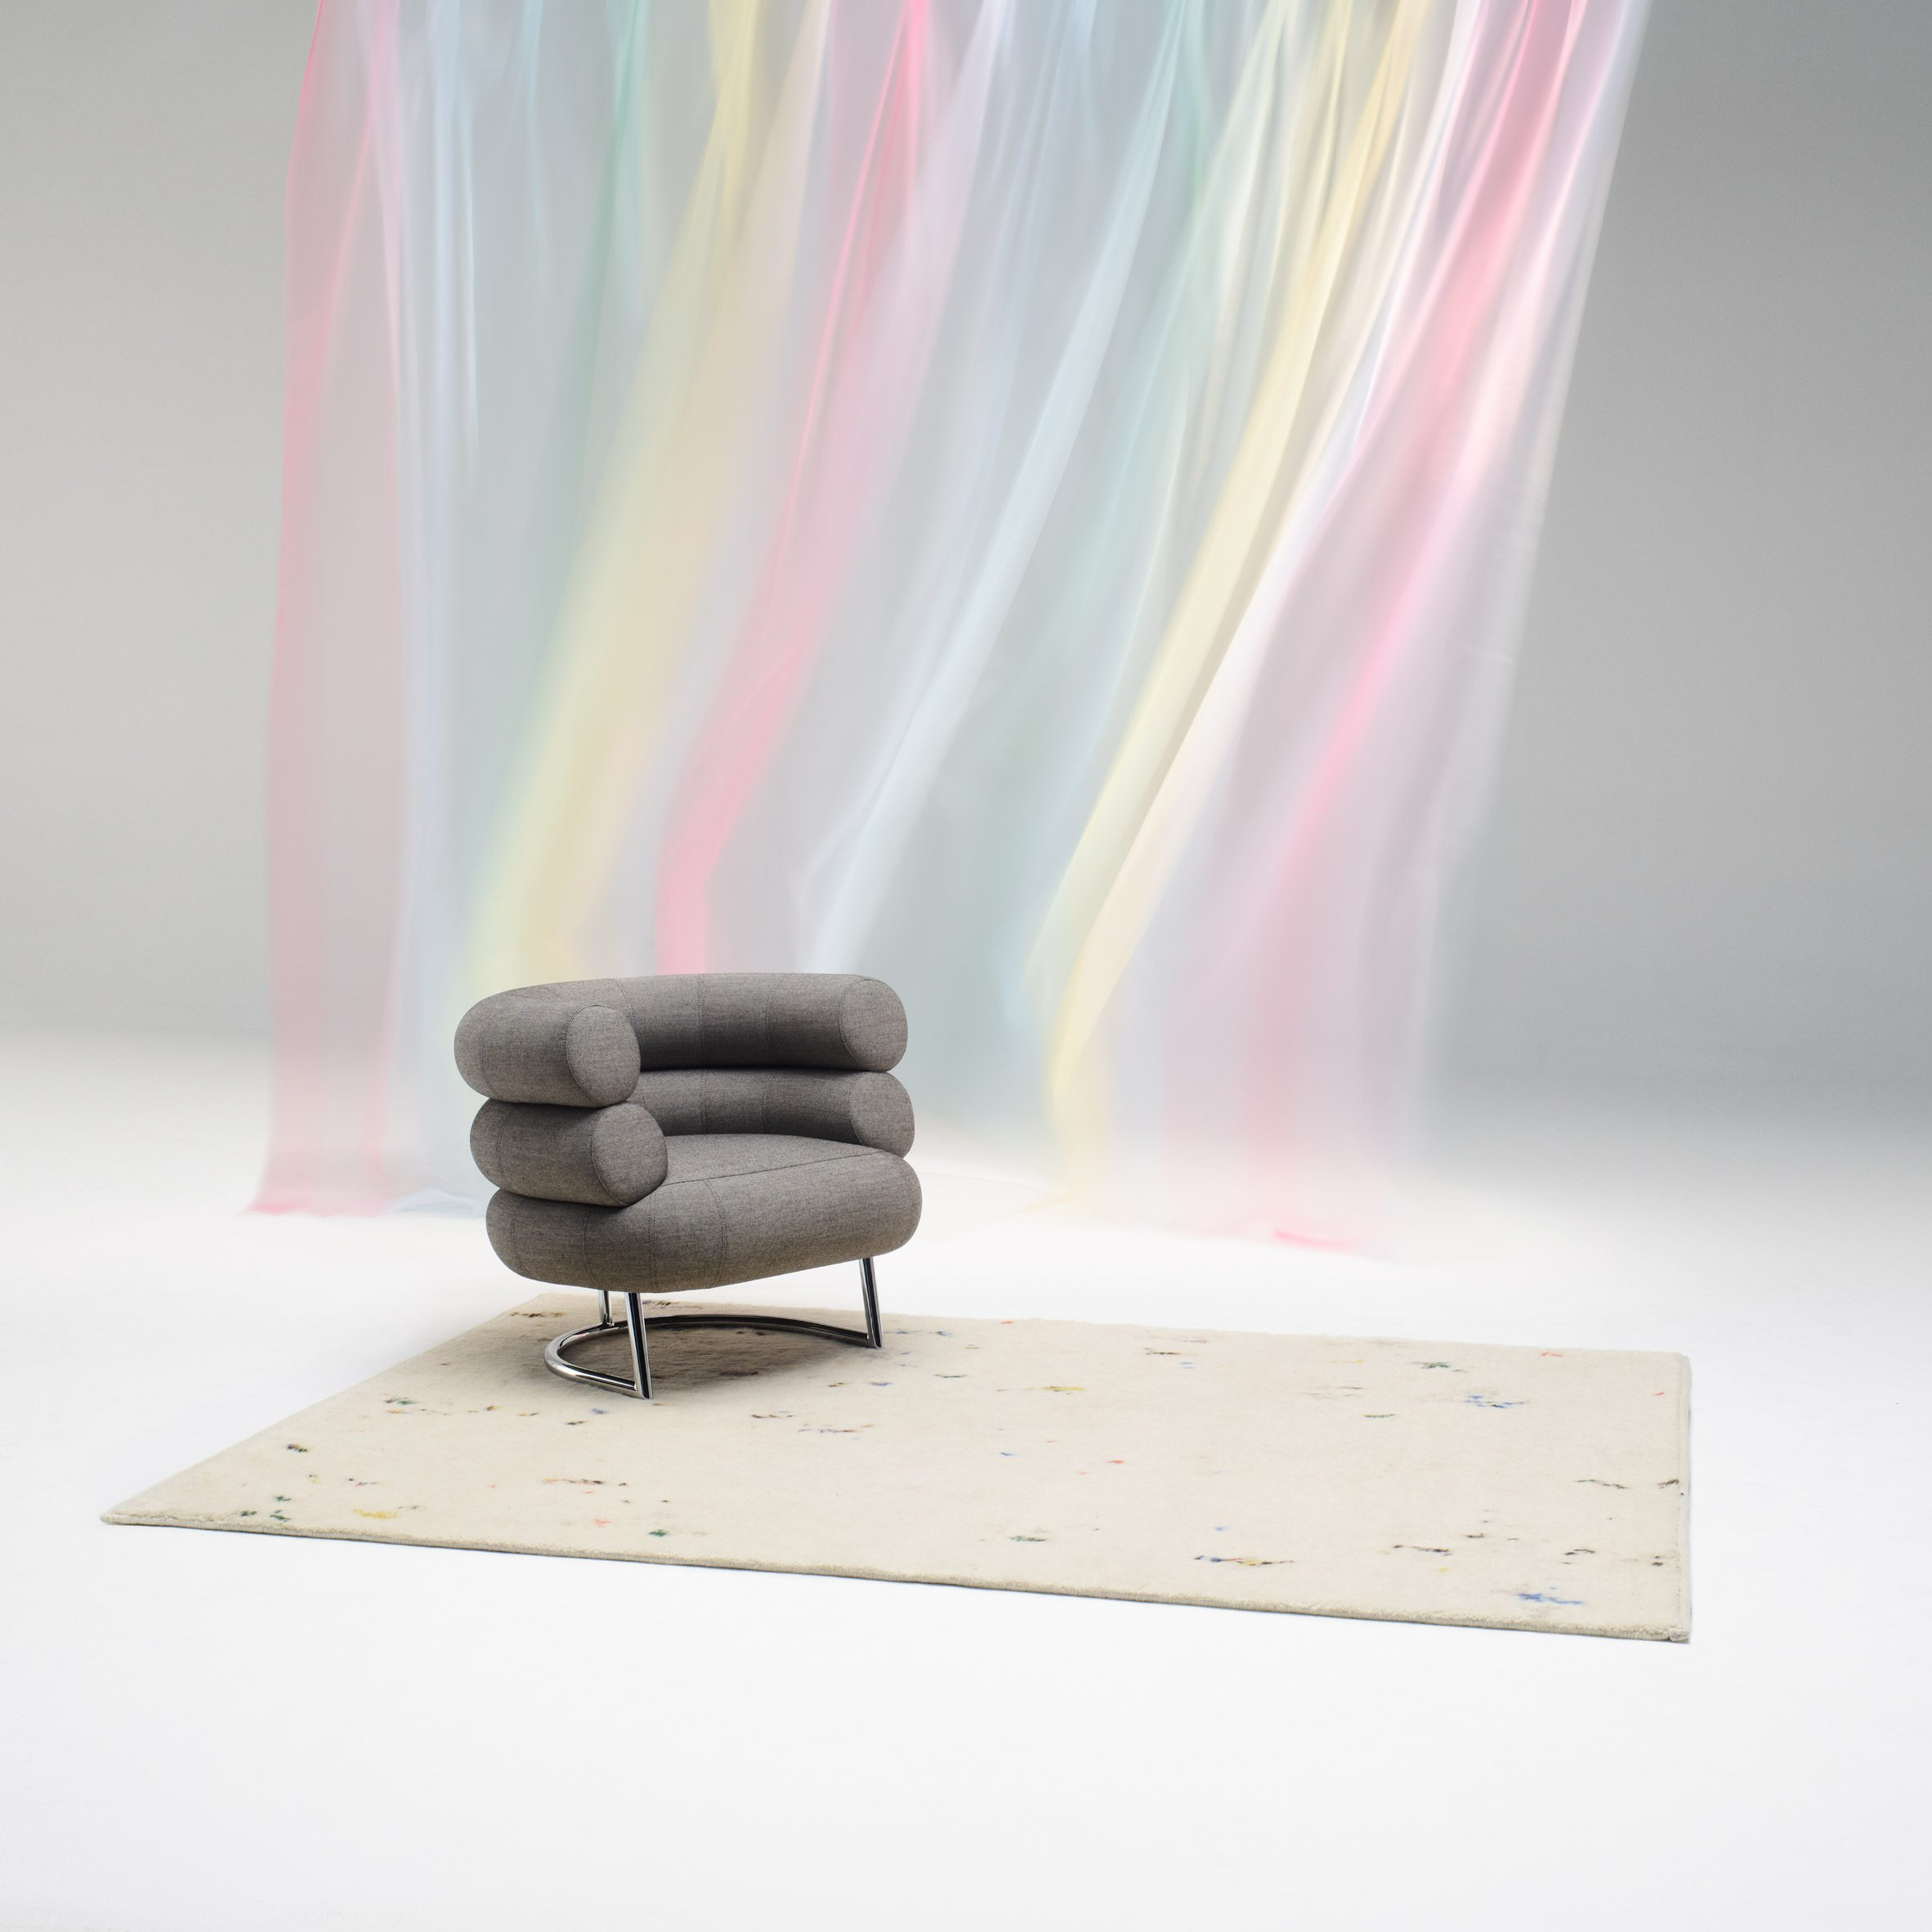 Peter Saville's Technicolour collection for Kvadrat